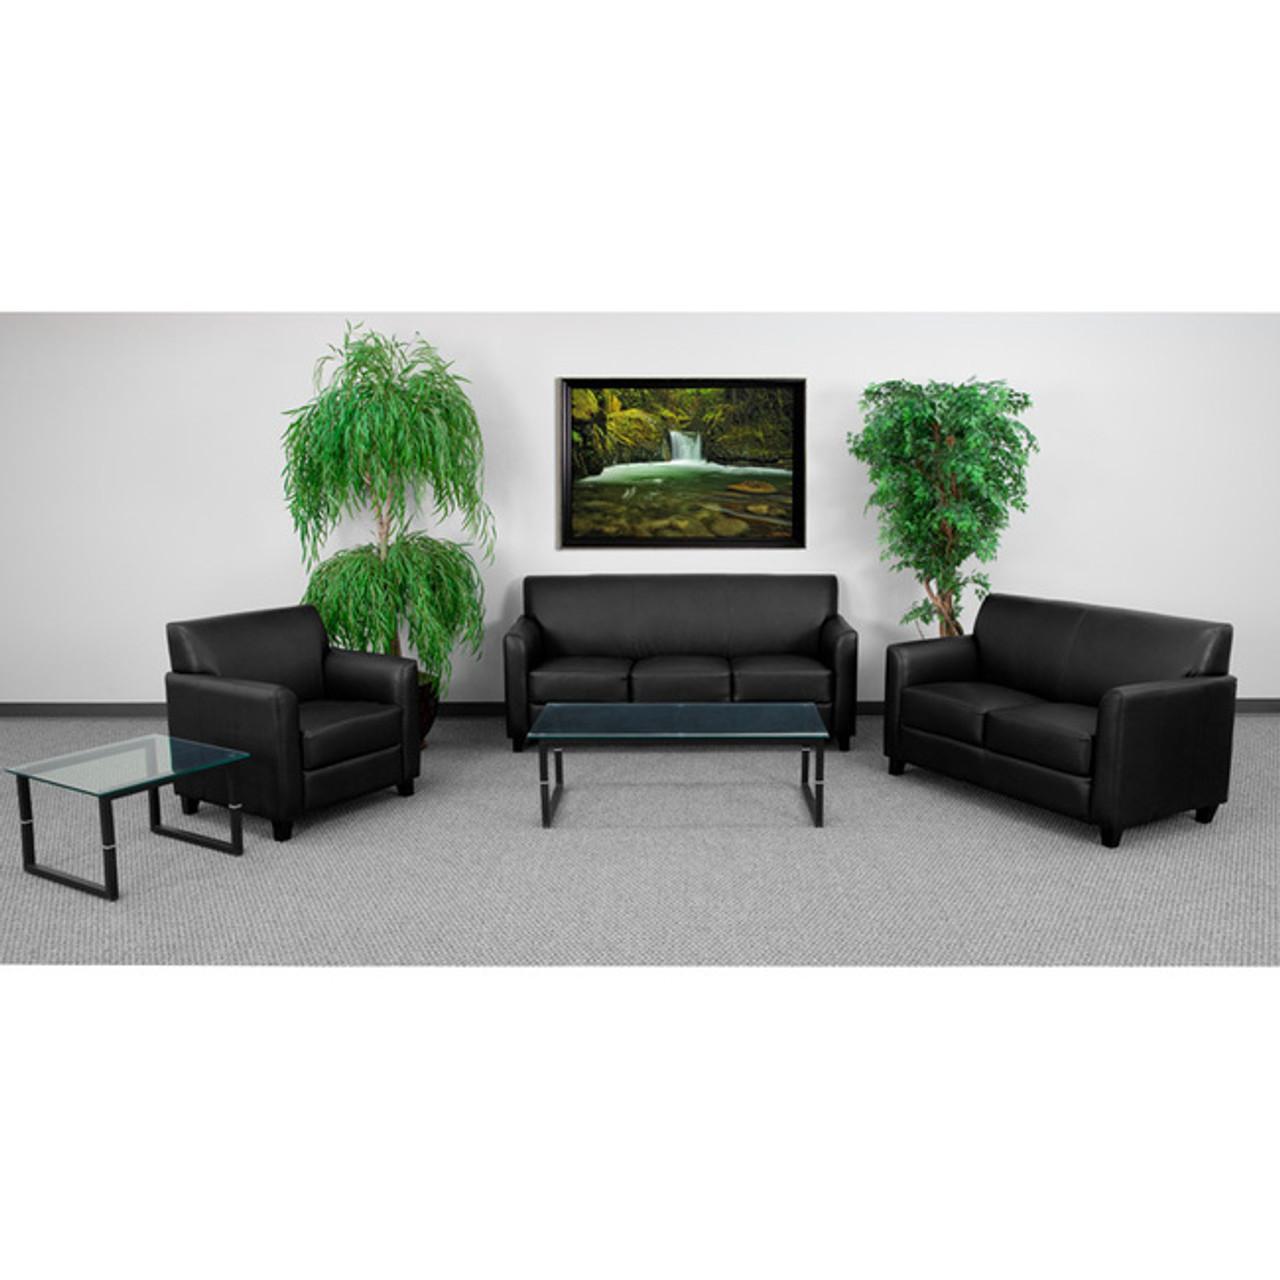 3pc Modern Leather Office Reception Sofa Set, FF-0551-13-S1